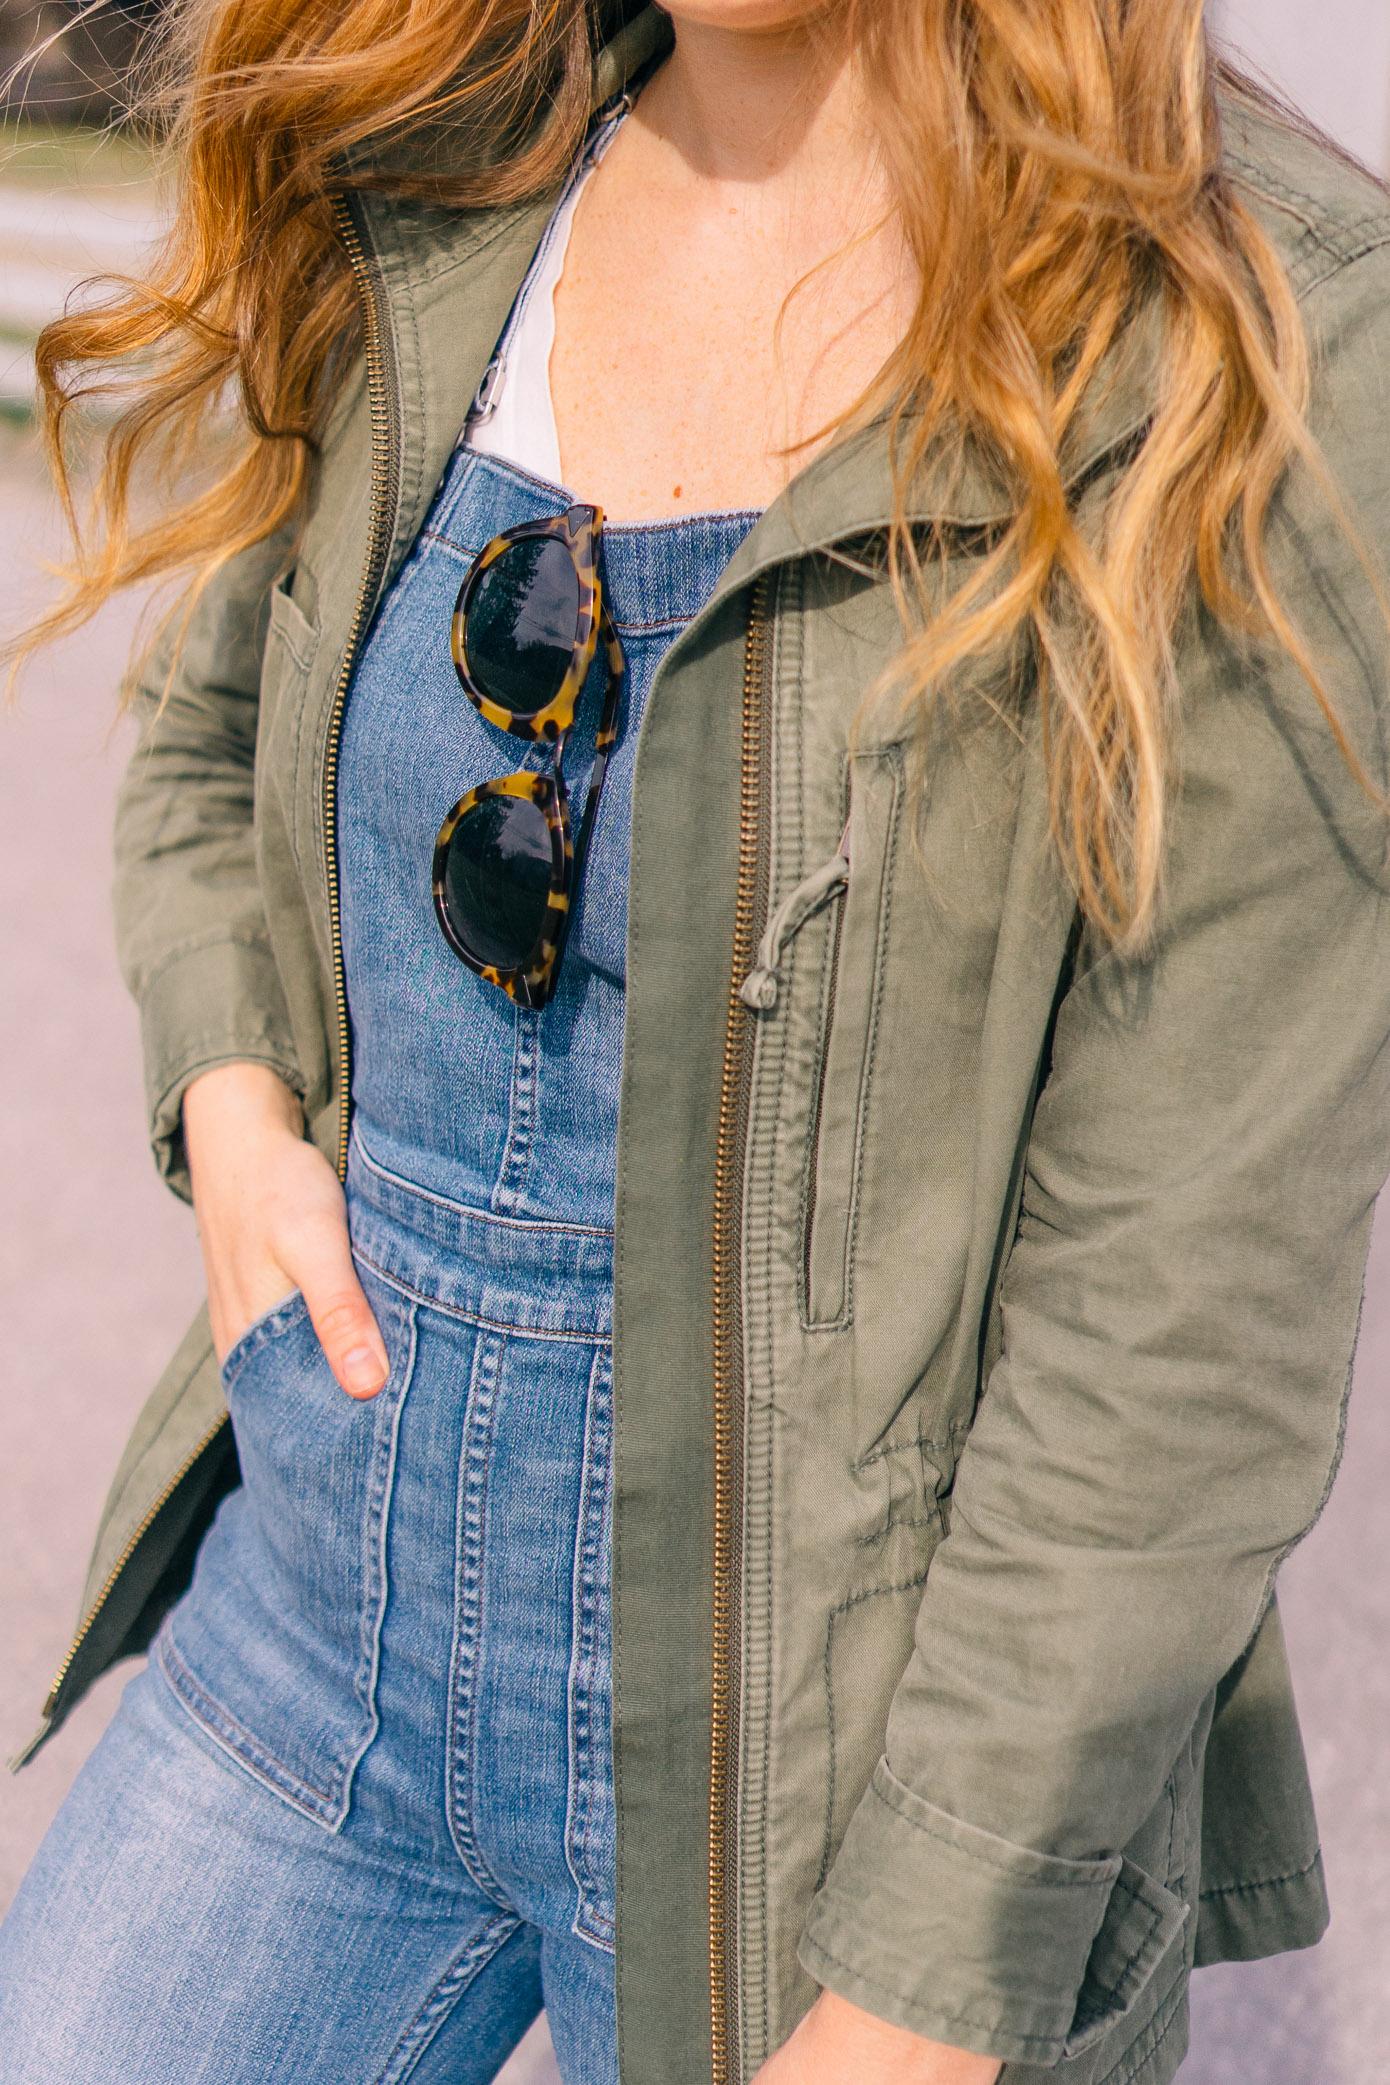 What to Wear Horseback Riding | Denim Overalls, Madewell Fleet Jacket | Louella Reese Life & Style Blog